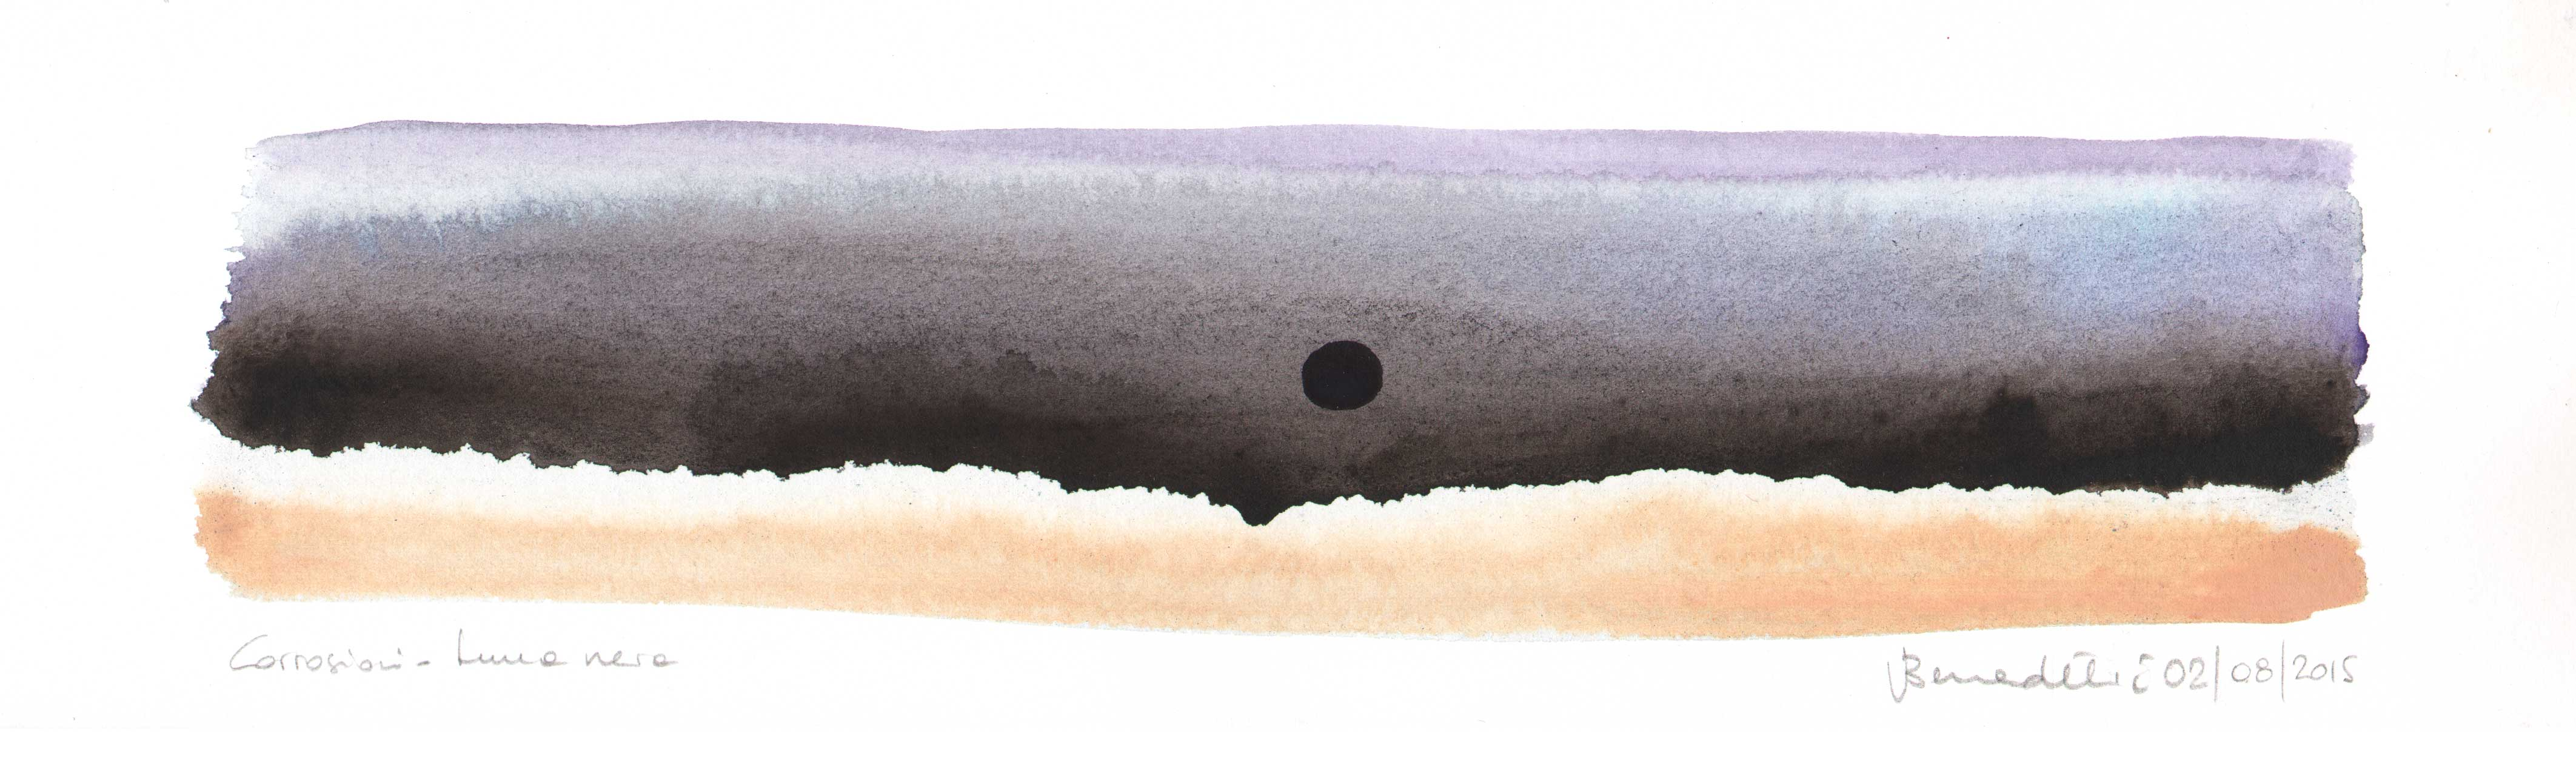 corrosioni.luna.nera.1.w.jpg